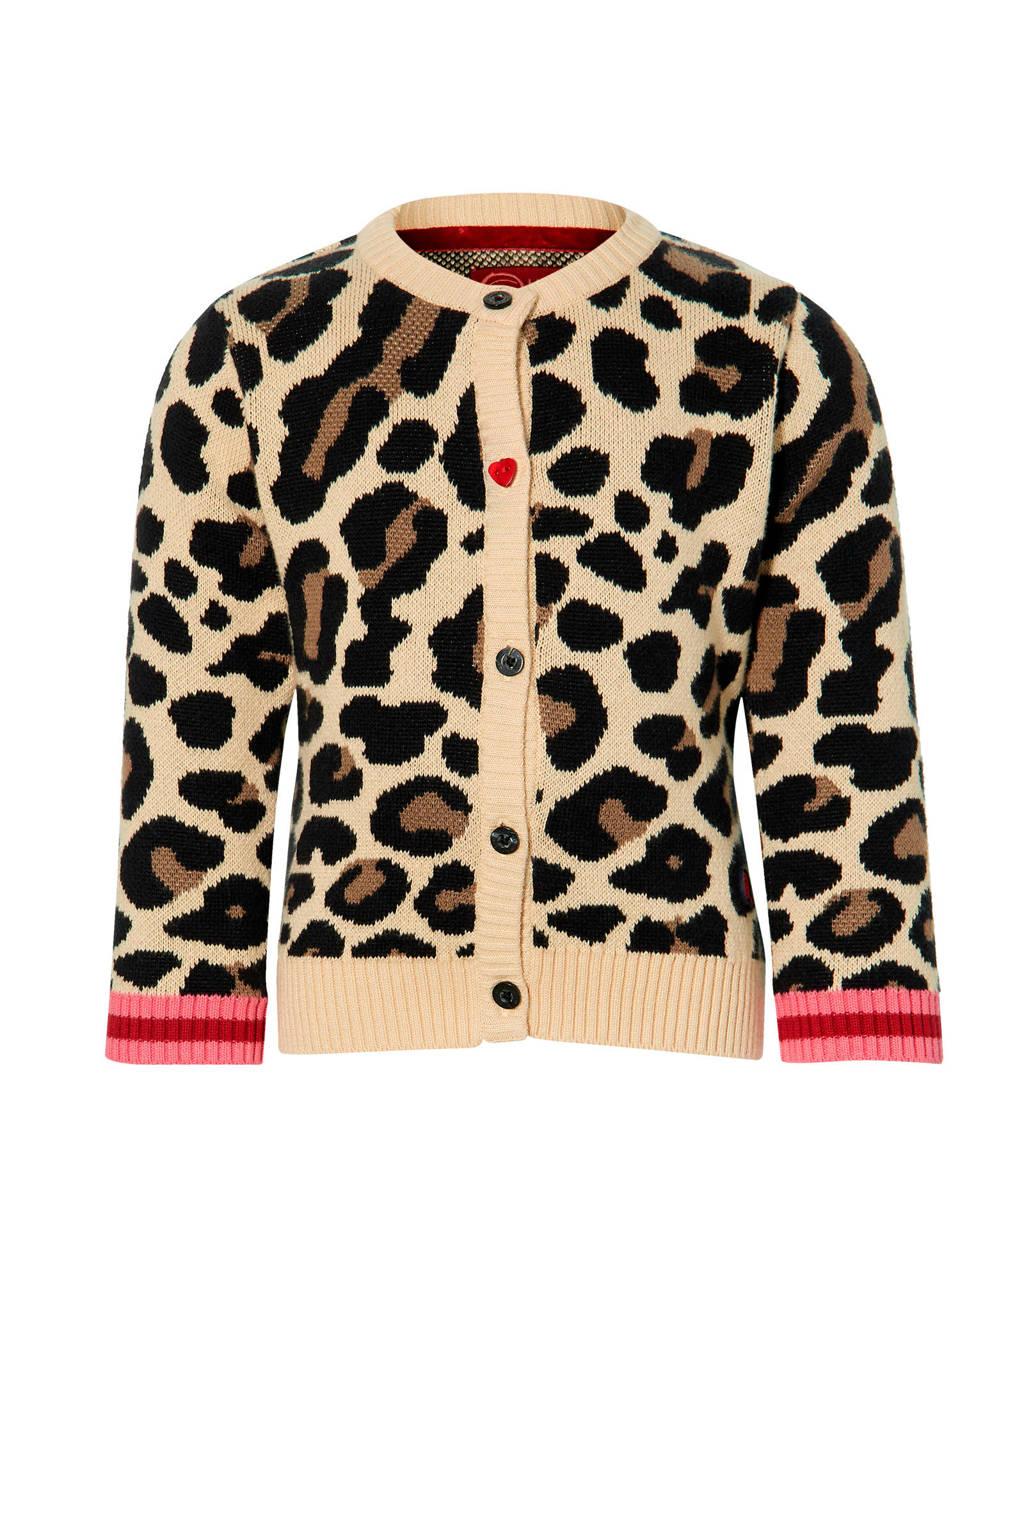 Quapi Mini vest Emely met panterprint lichtbruin/zwart, Lichtbruin/zwart